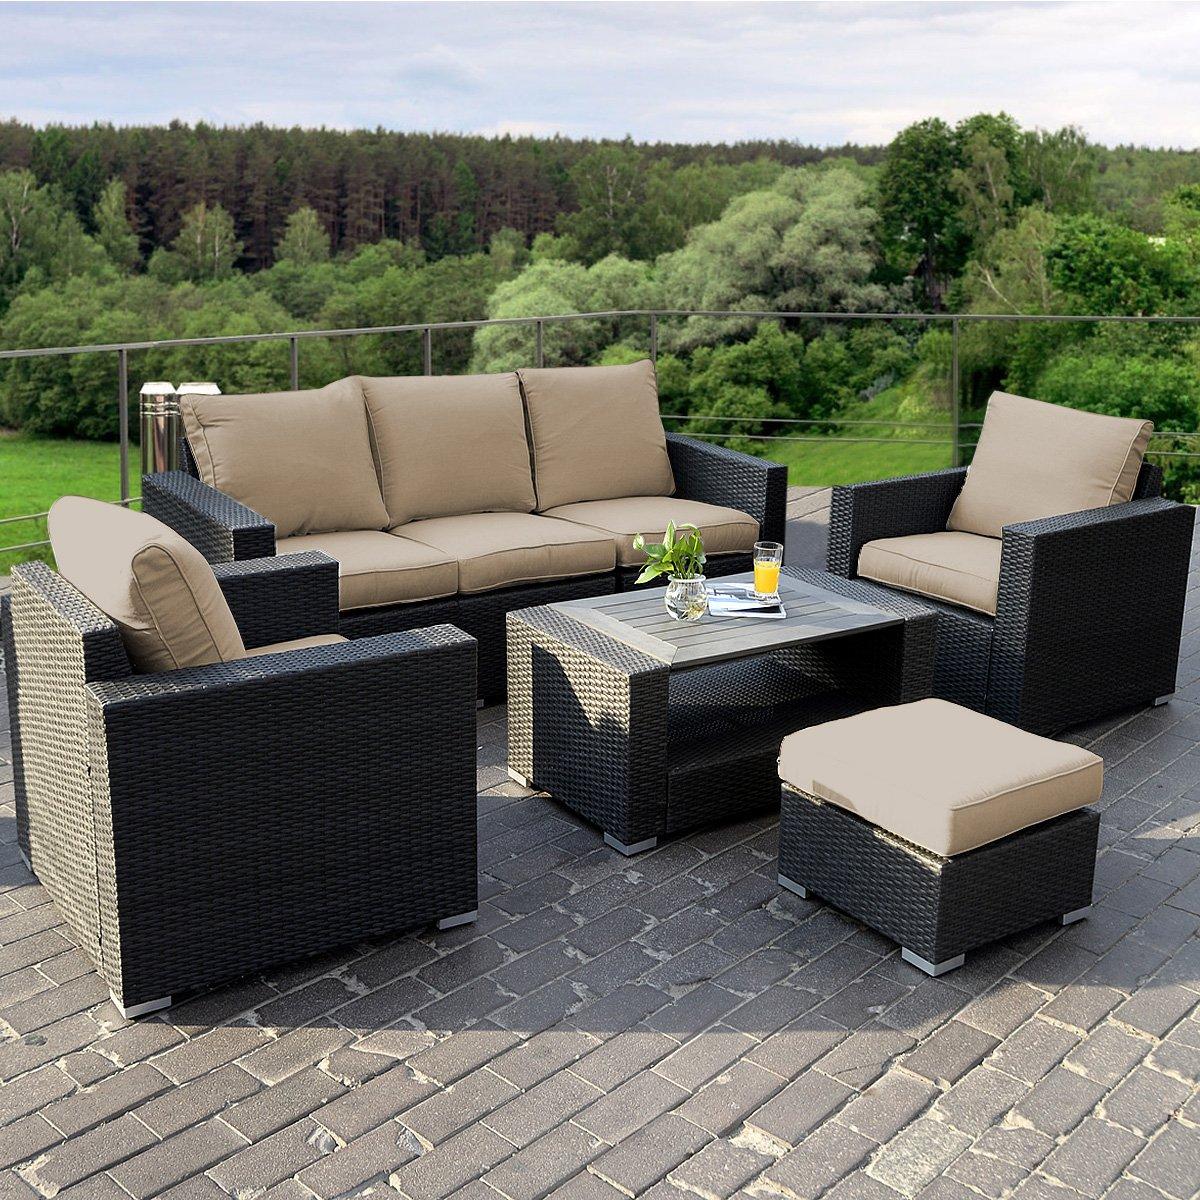 amazoncom giantex 7pc outdoor patio patio sectional furniture pe wicker rattan sofa set deck couch garden u0026 outdoor